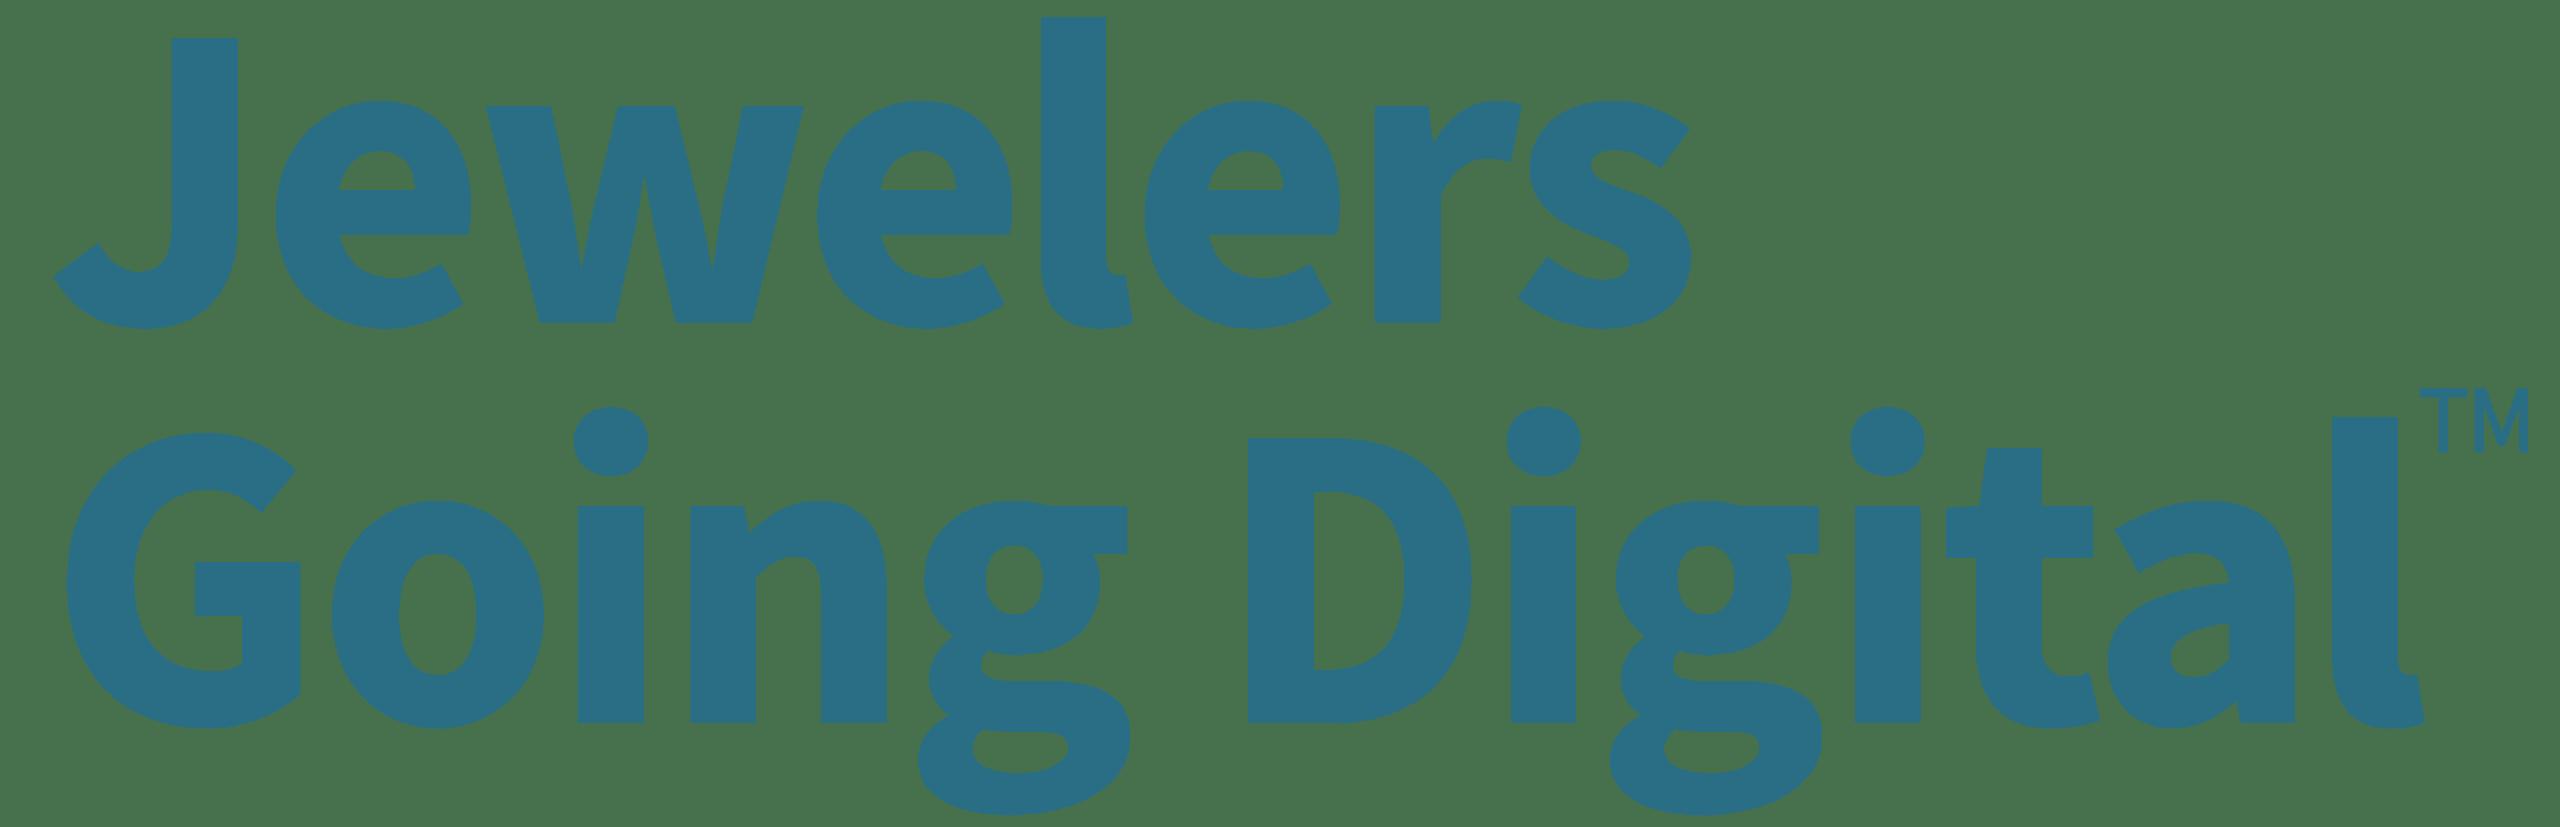 Jewelers Going Digital Logo